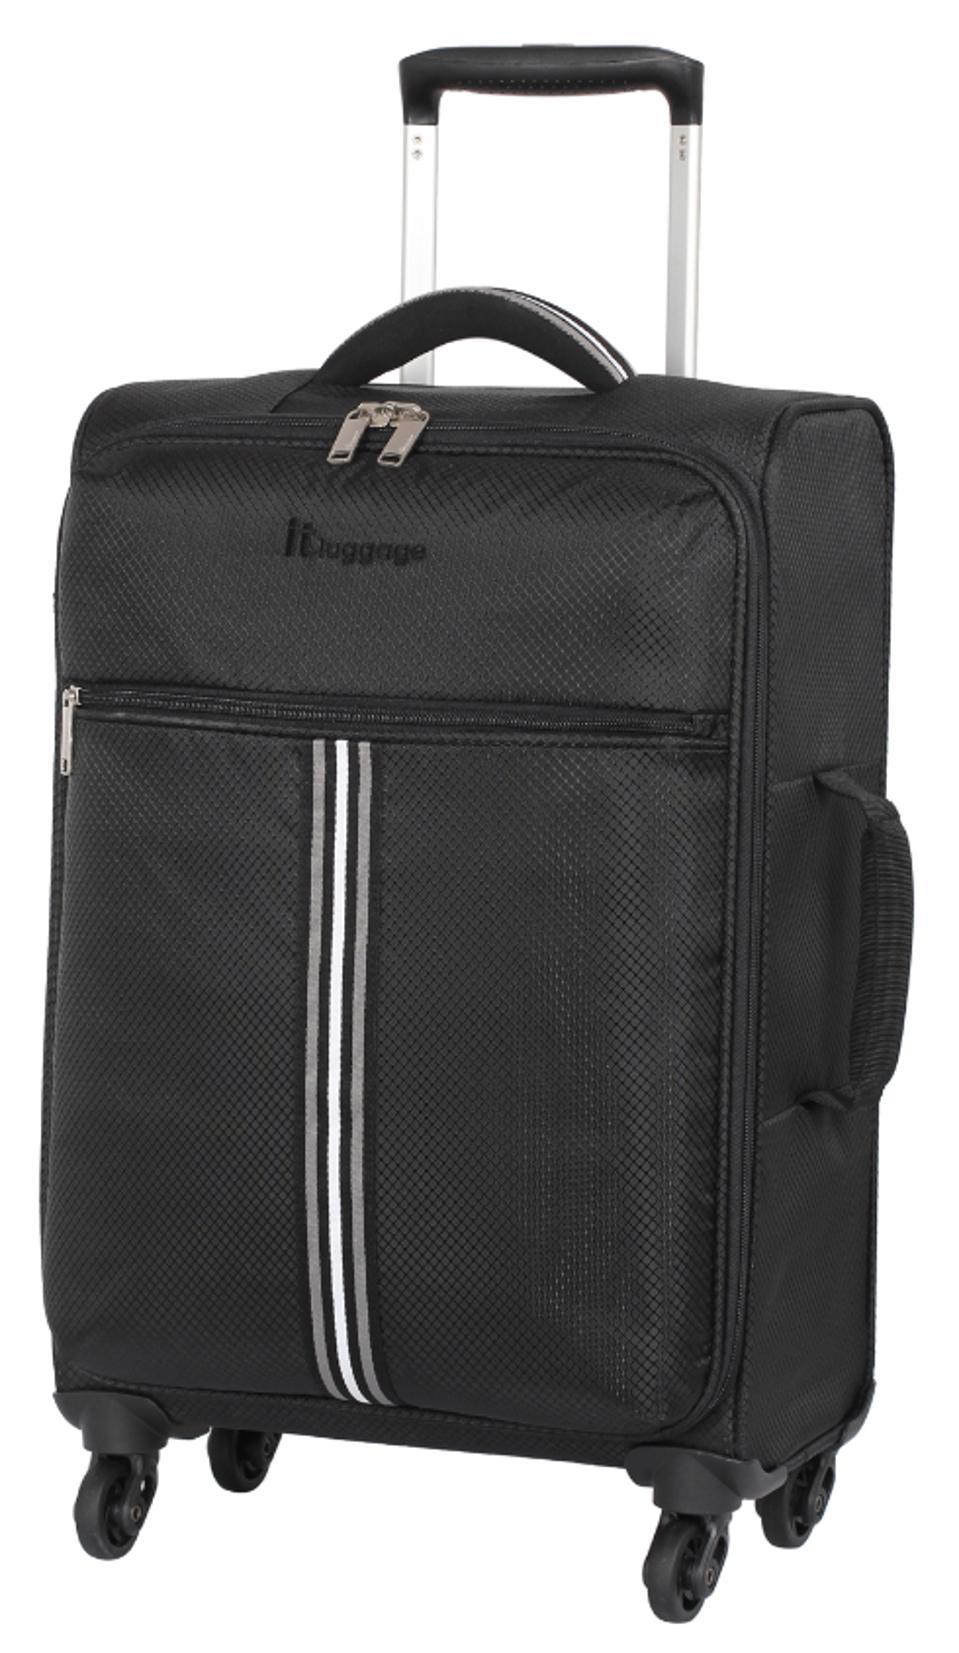 IT Luggage GT Lite